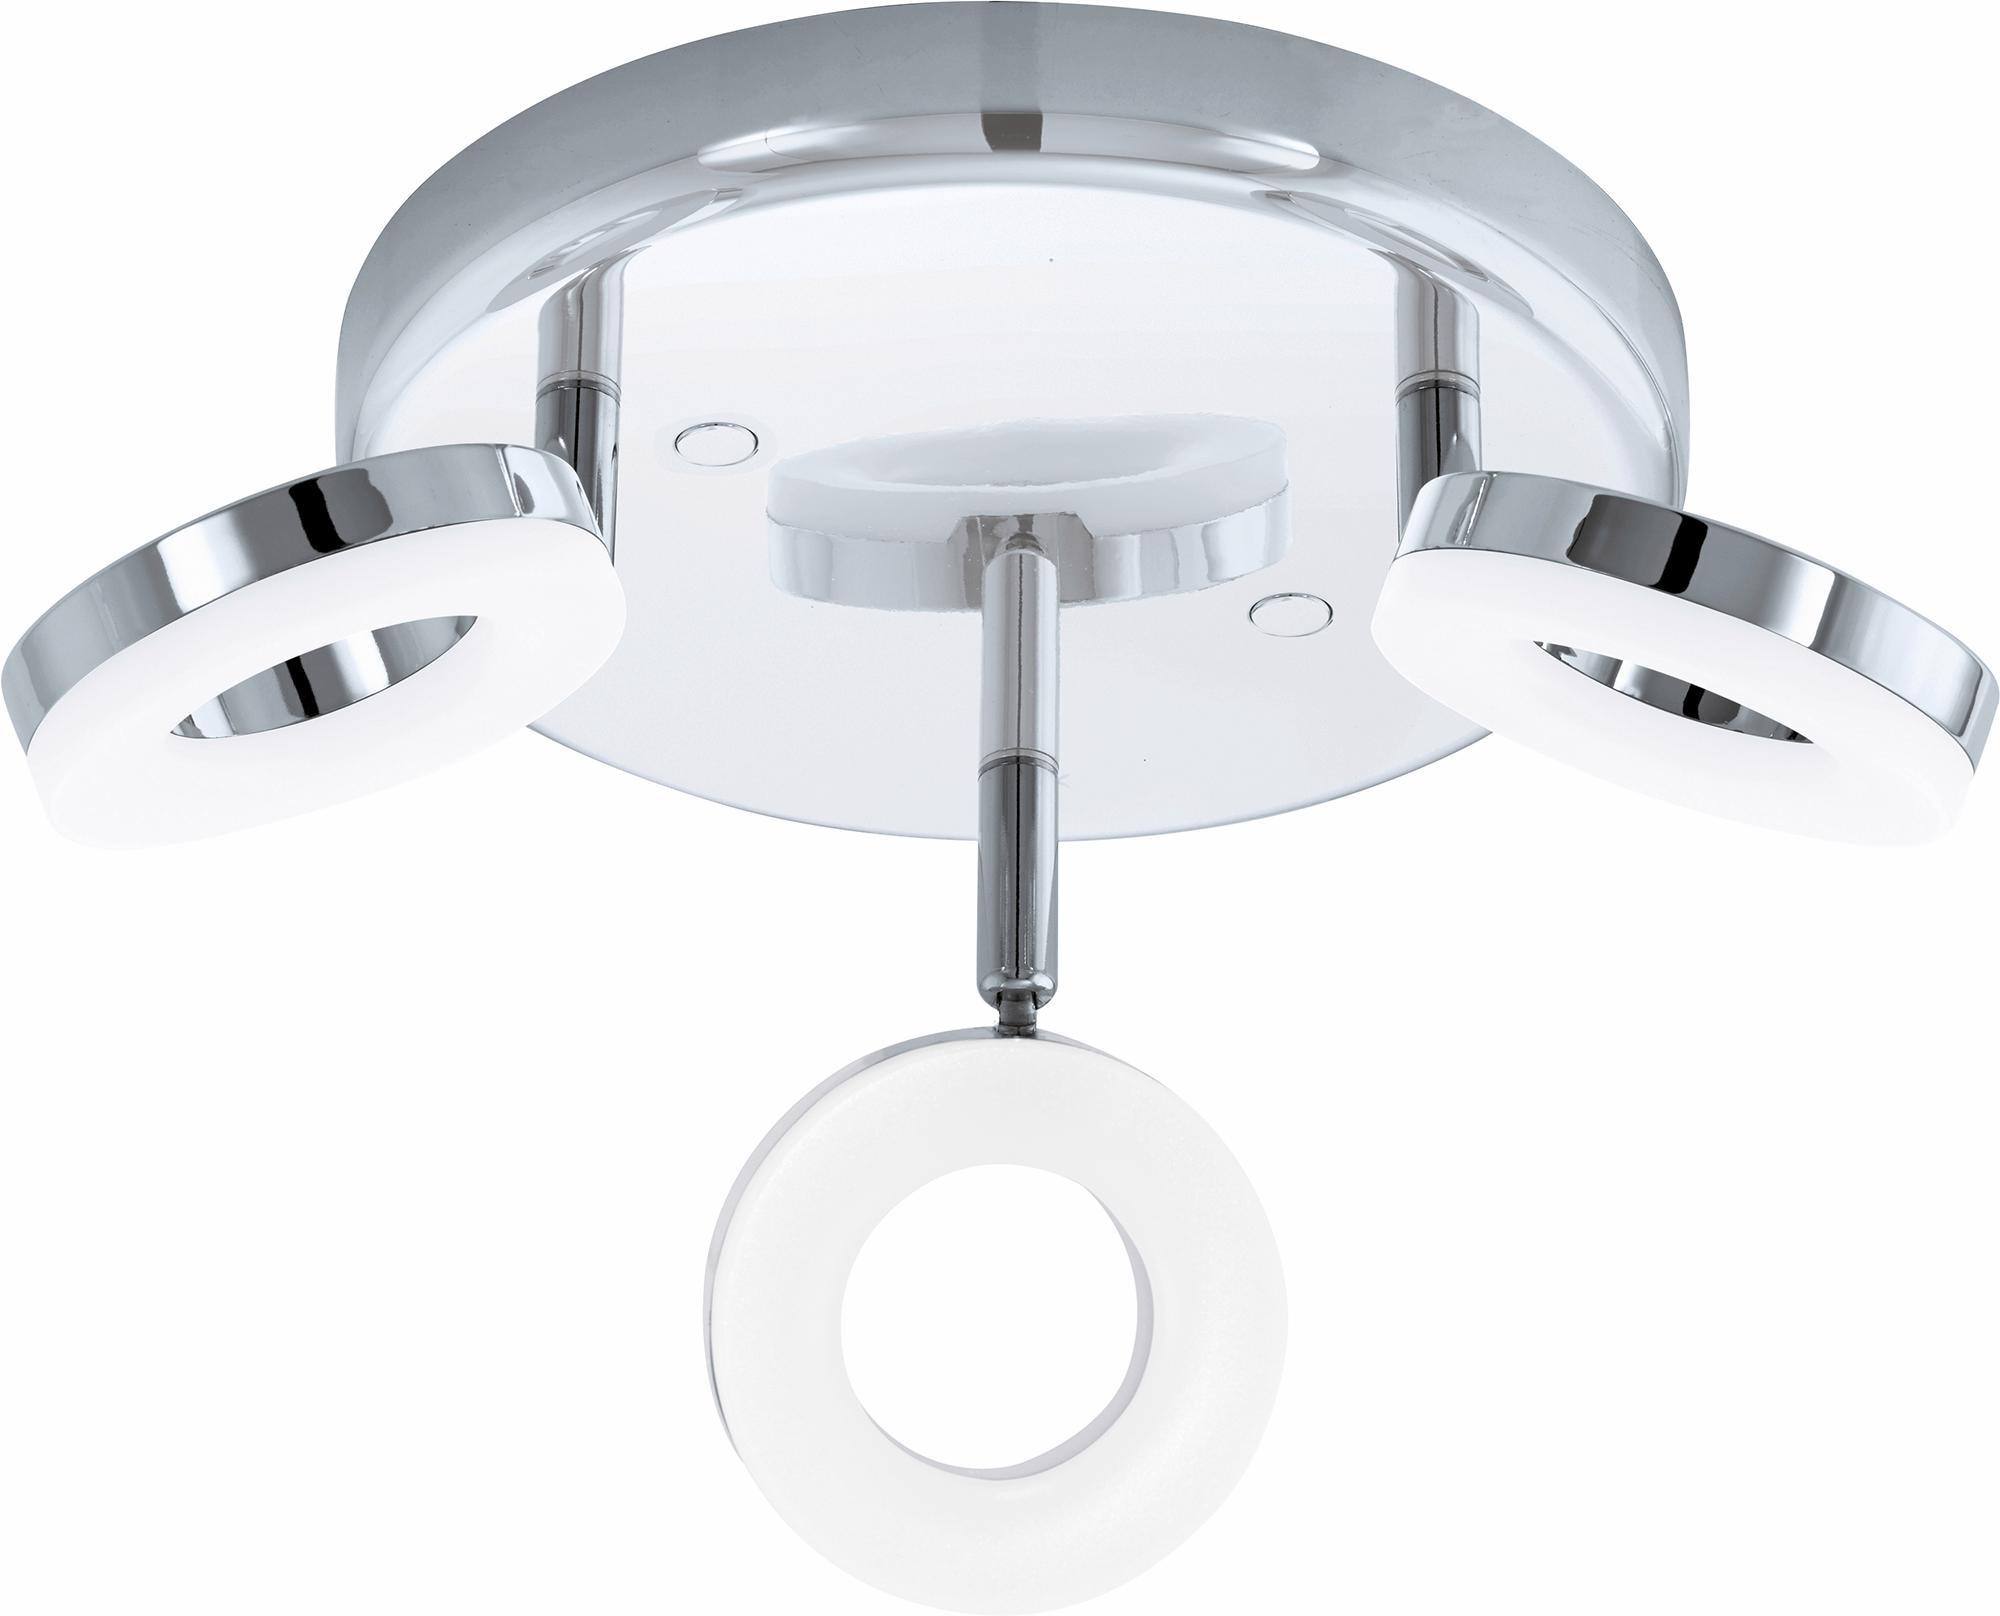 Eglo LED Deckenleuchte Badleuchte 3flg Ø 21 cm GONARO